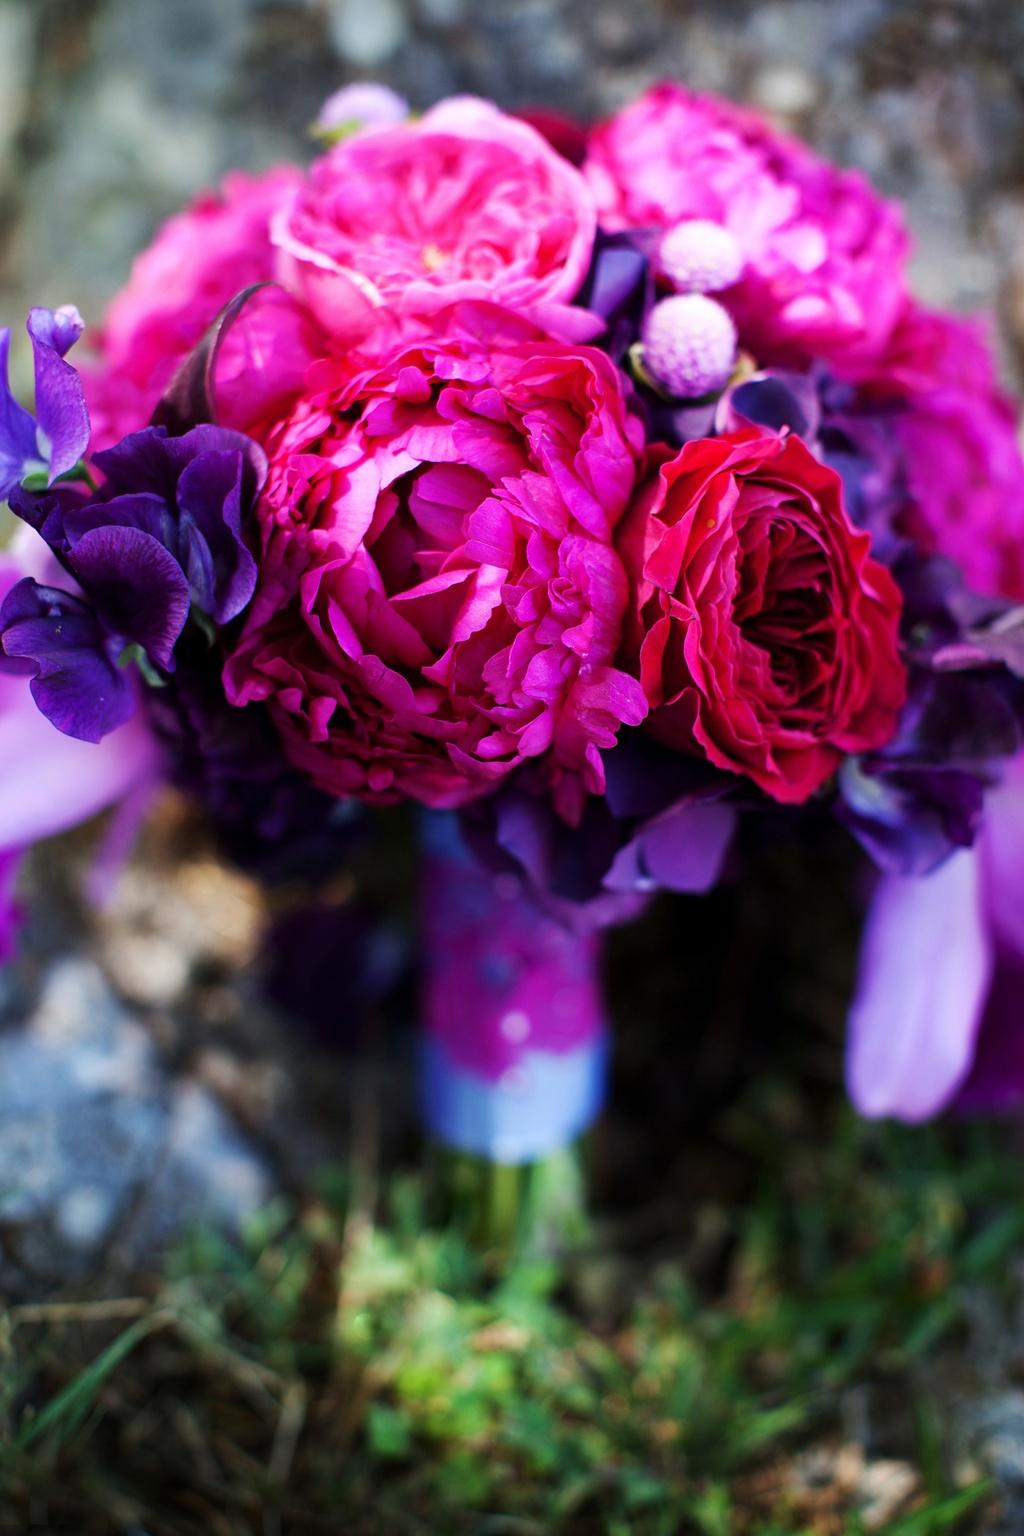 Elegant-malibu-wedding-with-bold-wedding-flowers-purple-pink-bouquet.full